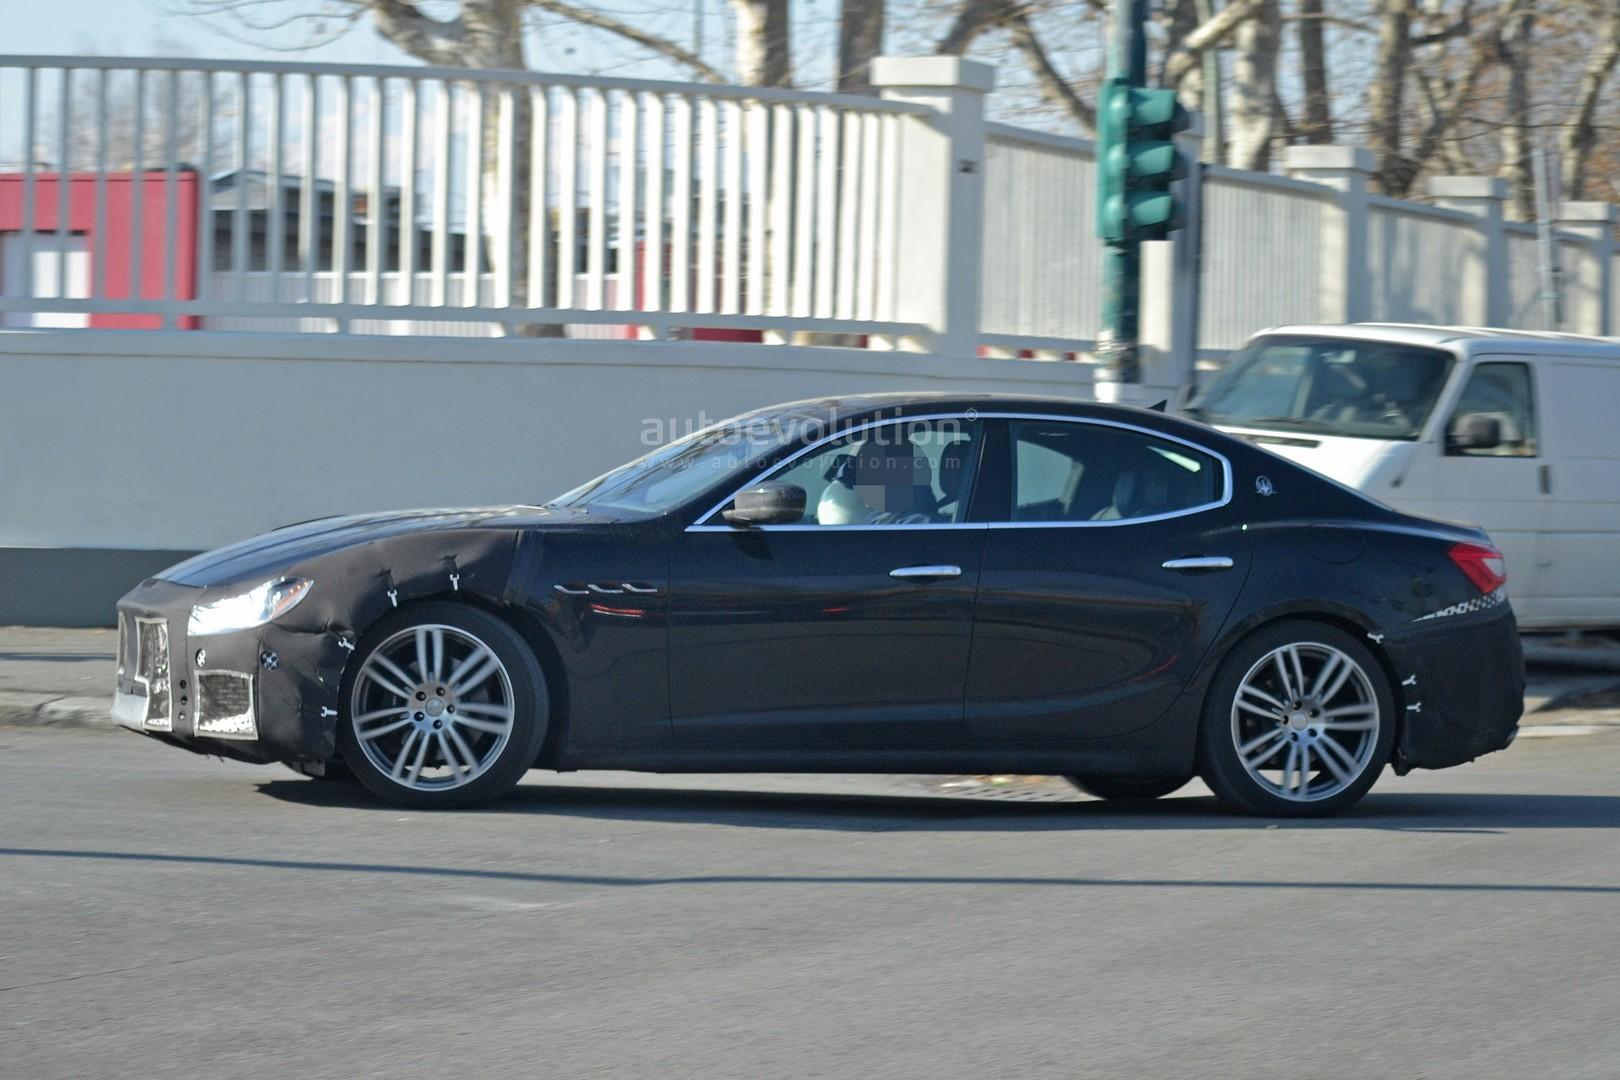 Spyshots 2018 Maserati Ghibli Facelift Gets New Grille